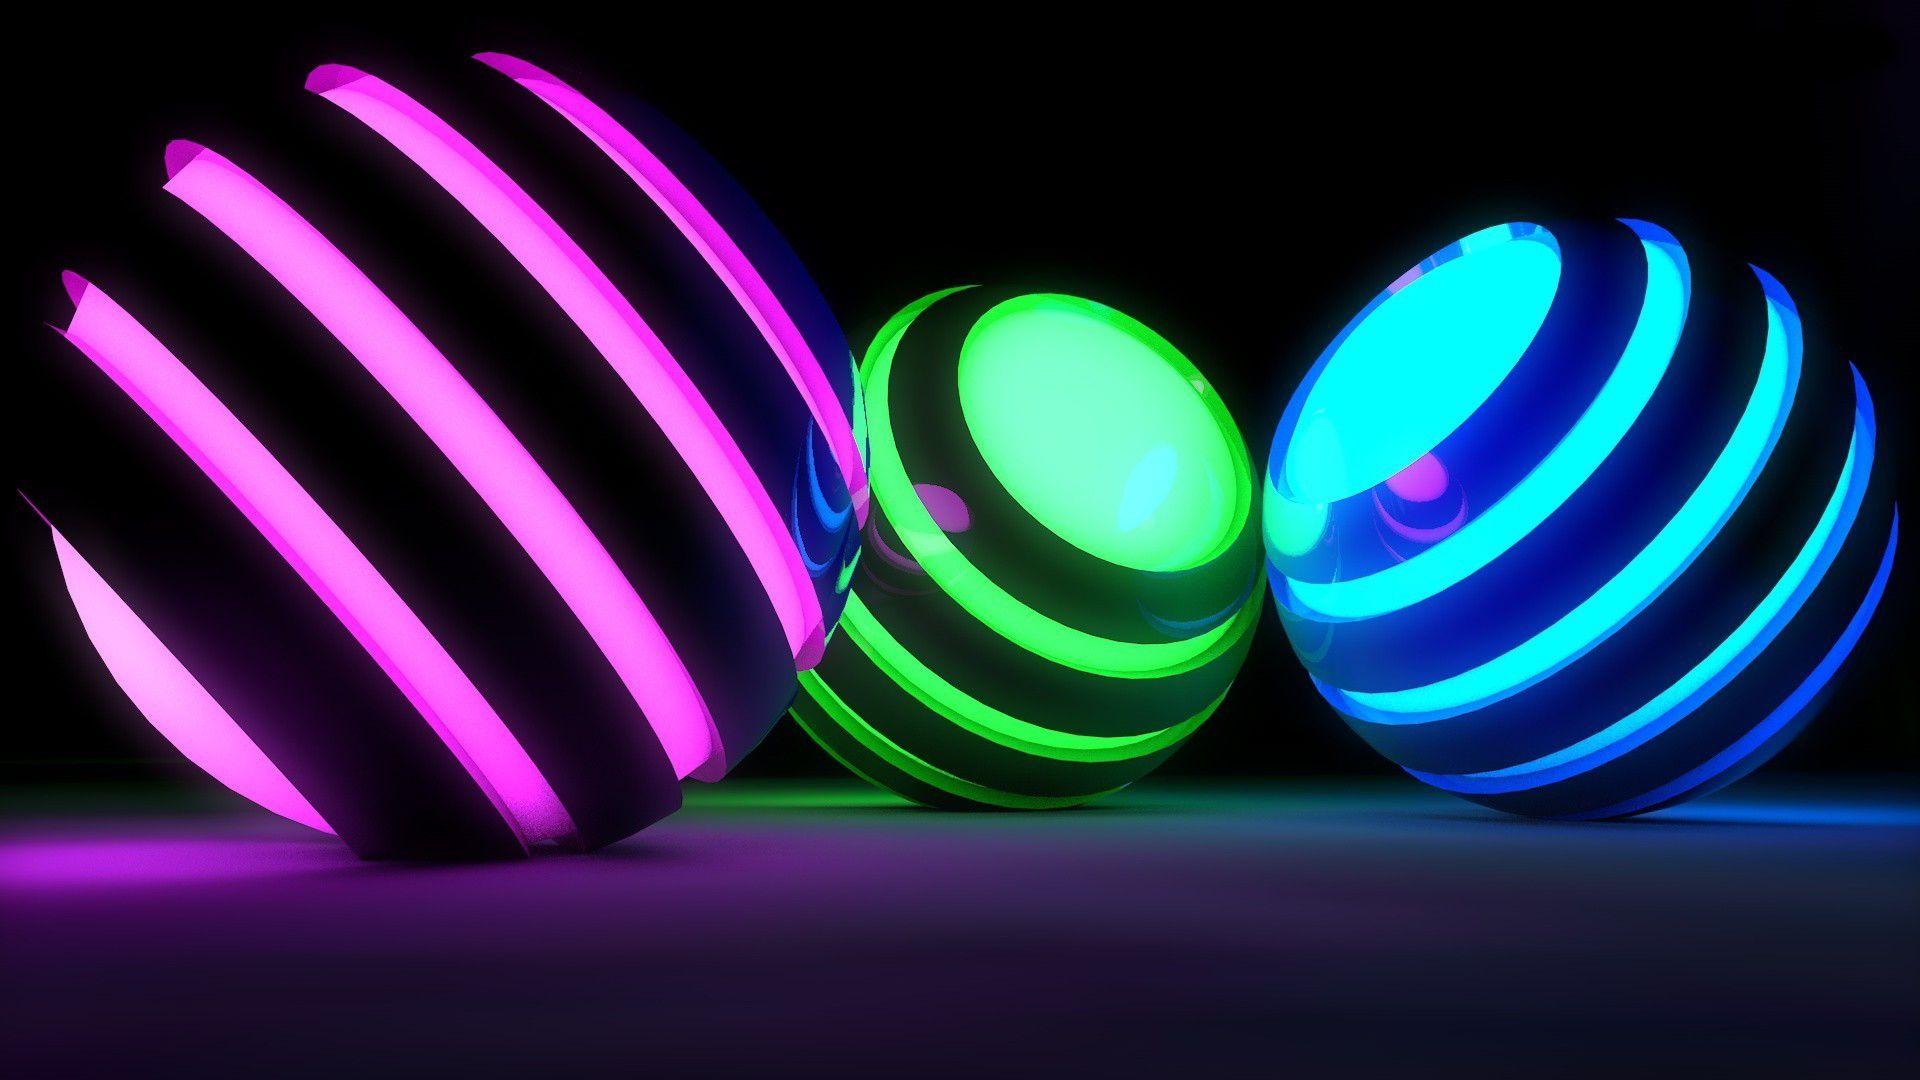 Best Wallpapers Hd For Mobile Phones: Neon Wallpapers : Find Best Latest Neon Wallpapers In HD